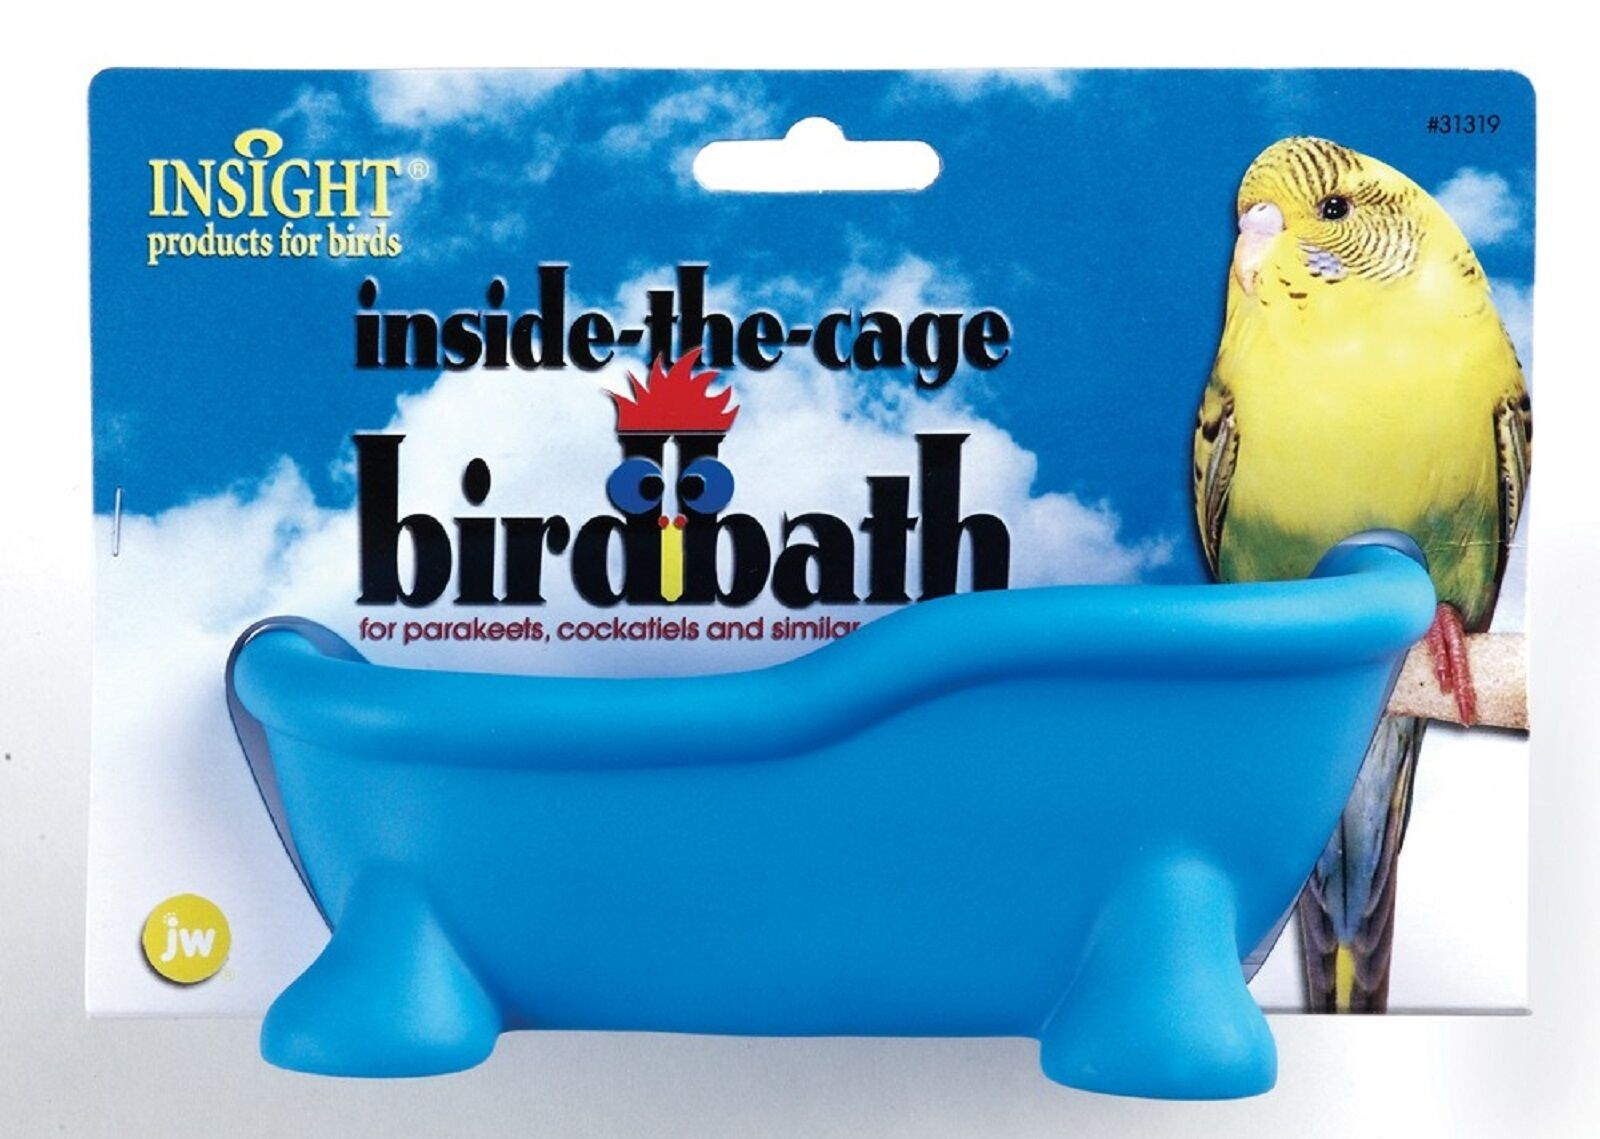 Insight Inside-the-cage Birdbath